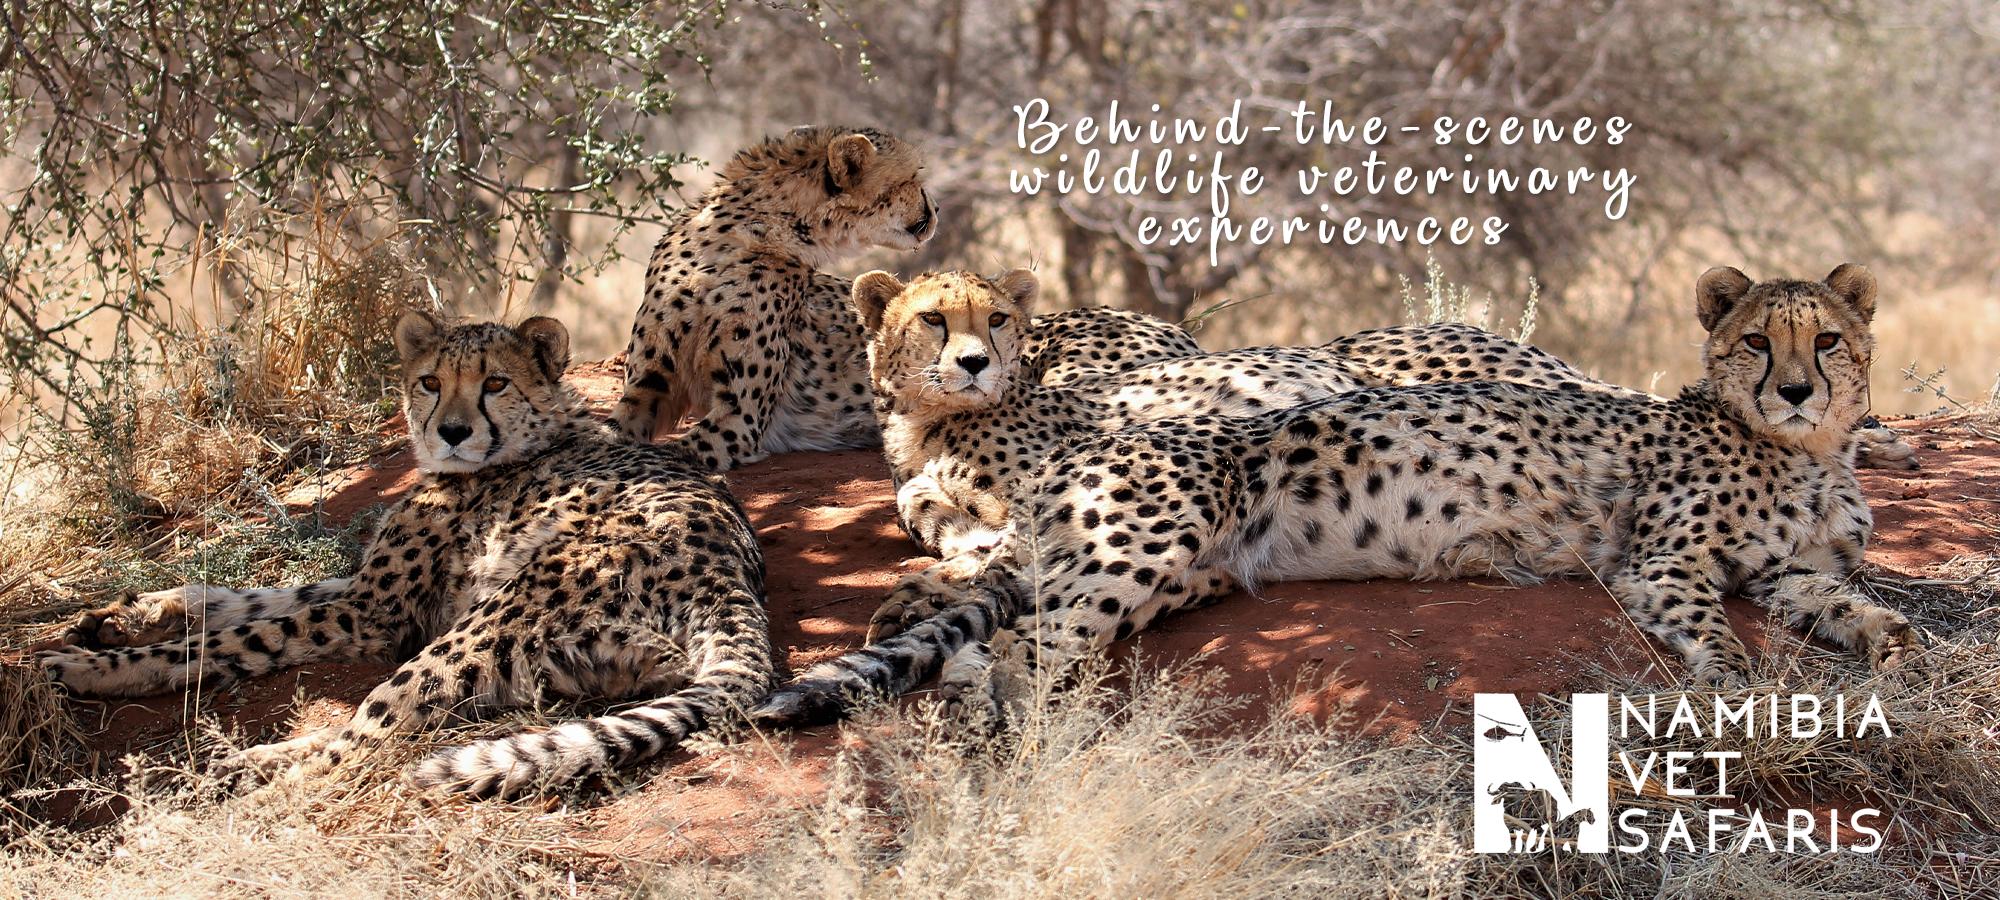 Namibia Vet Safaris